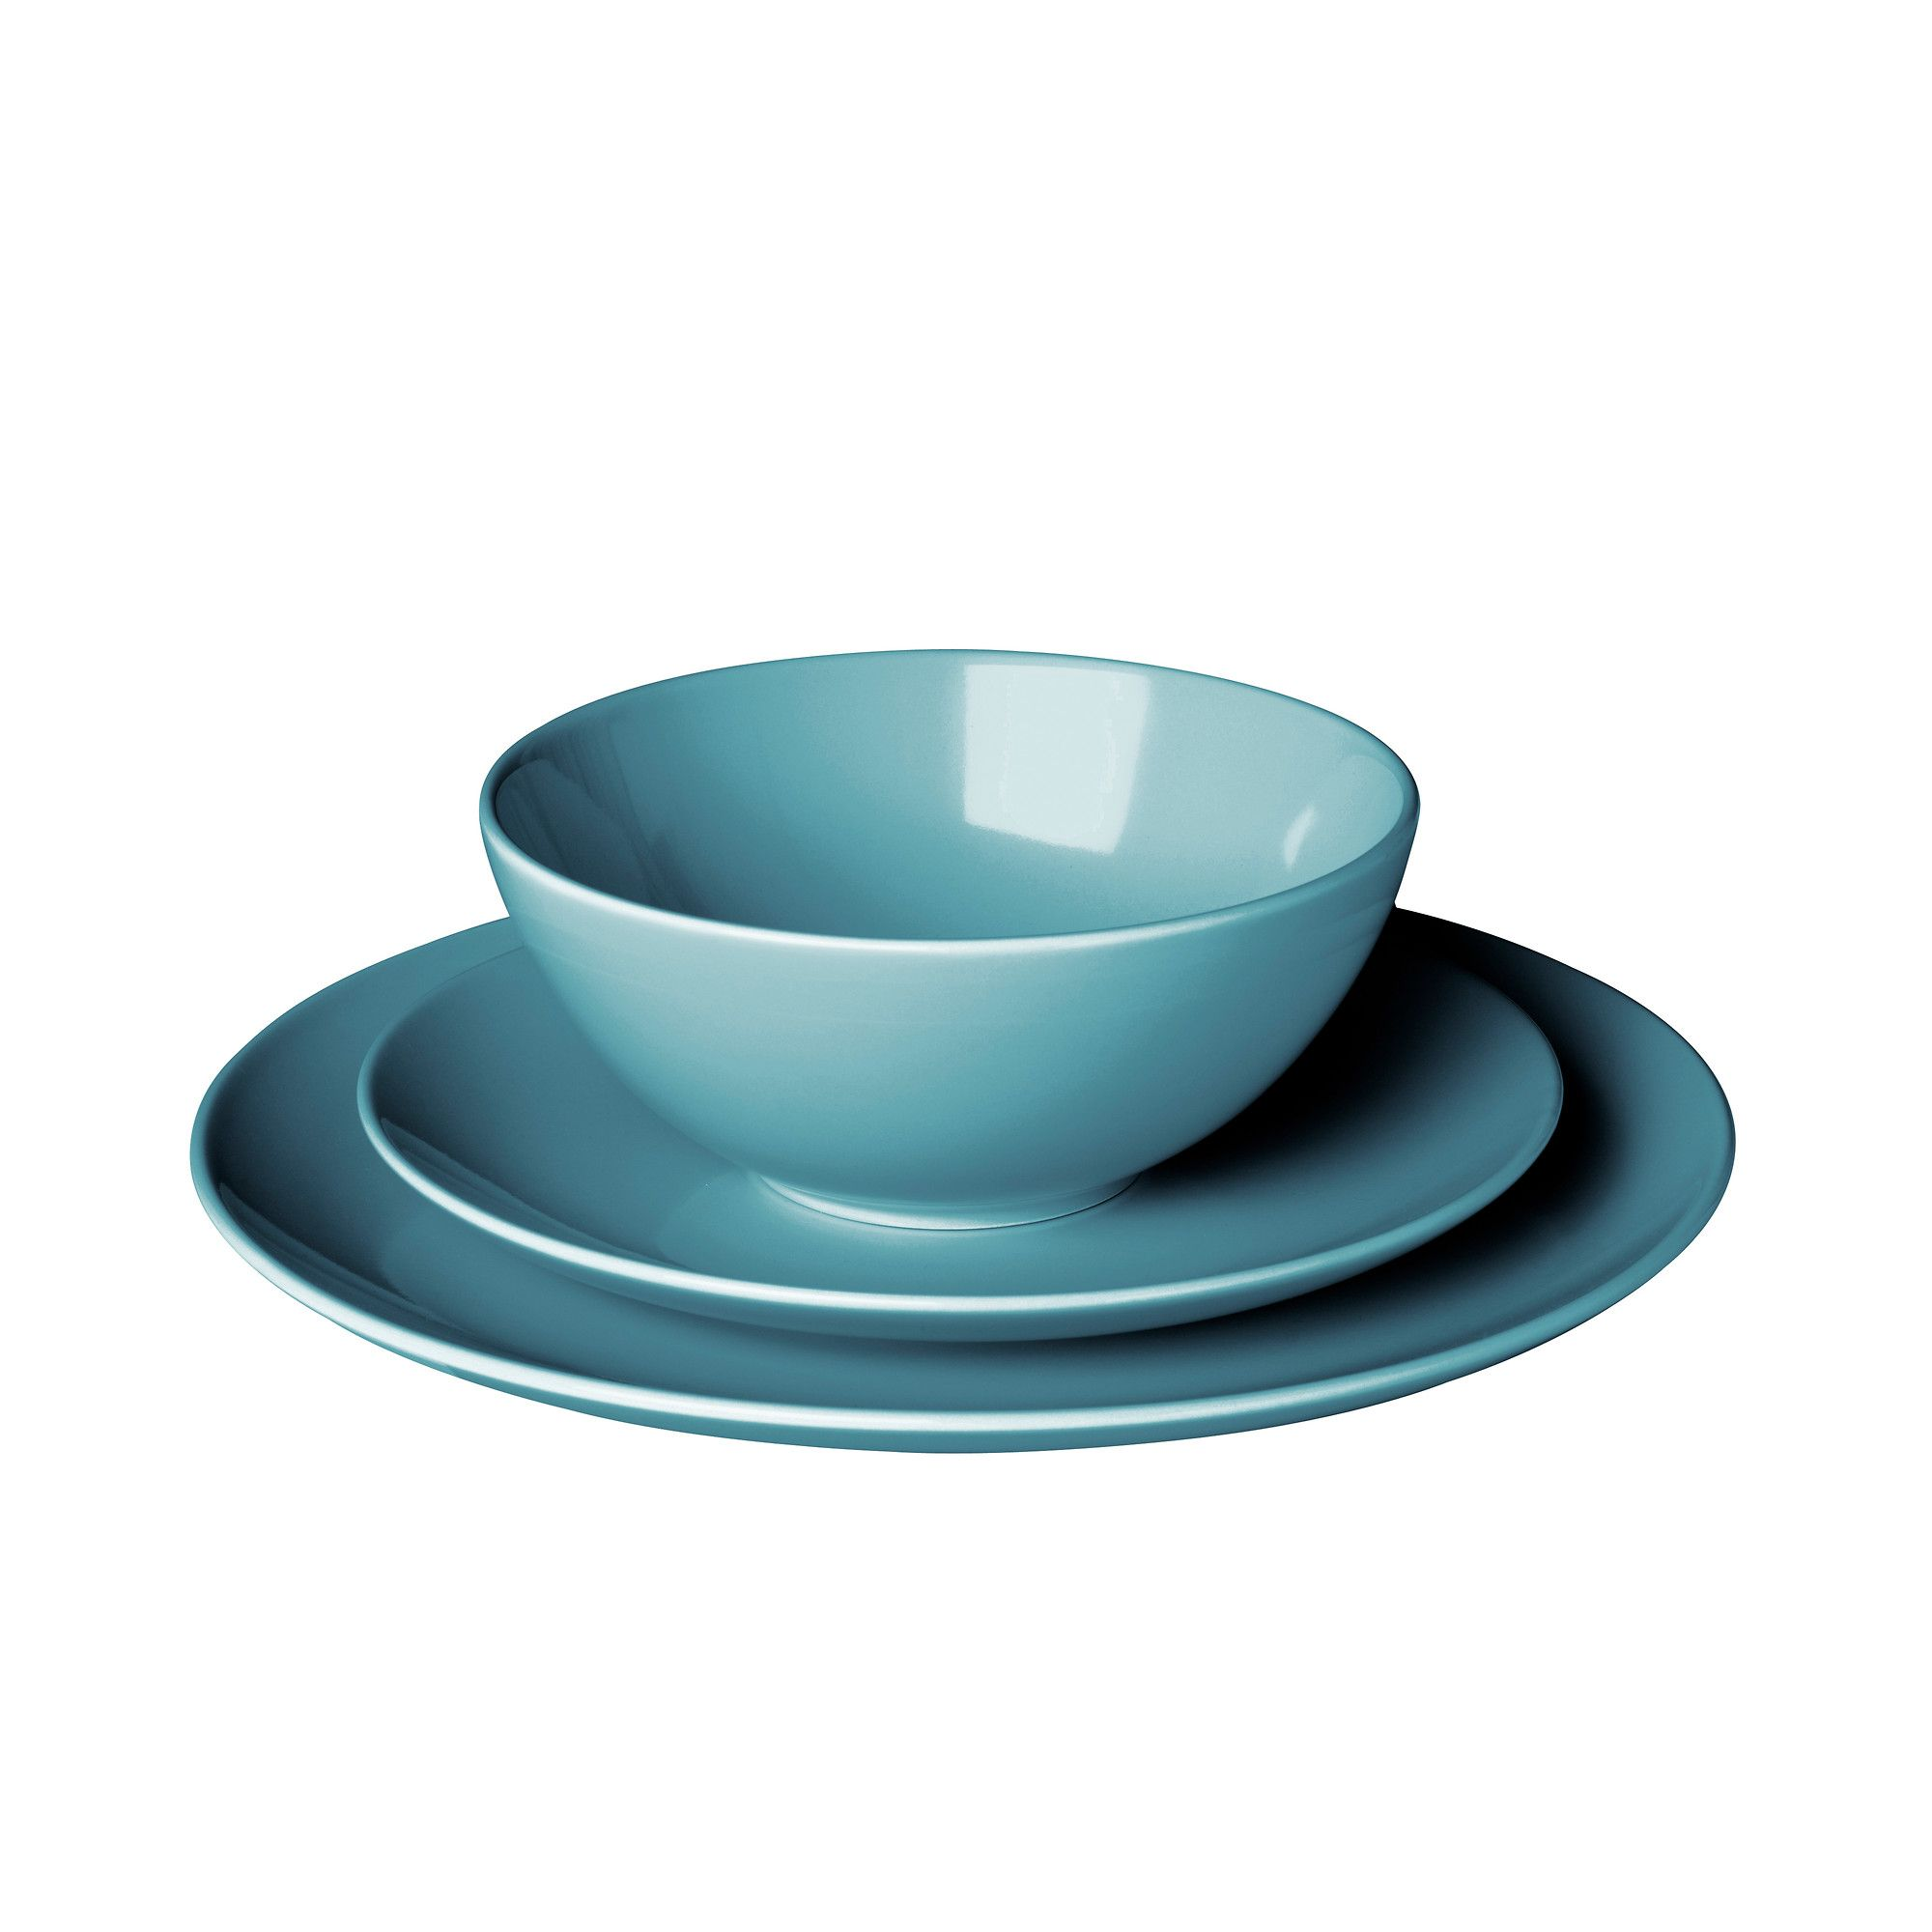 Porcelain Dinnerware Sets Fruit Shape Lemon Bowls Watermelon Mug